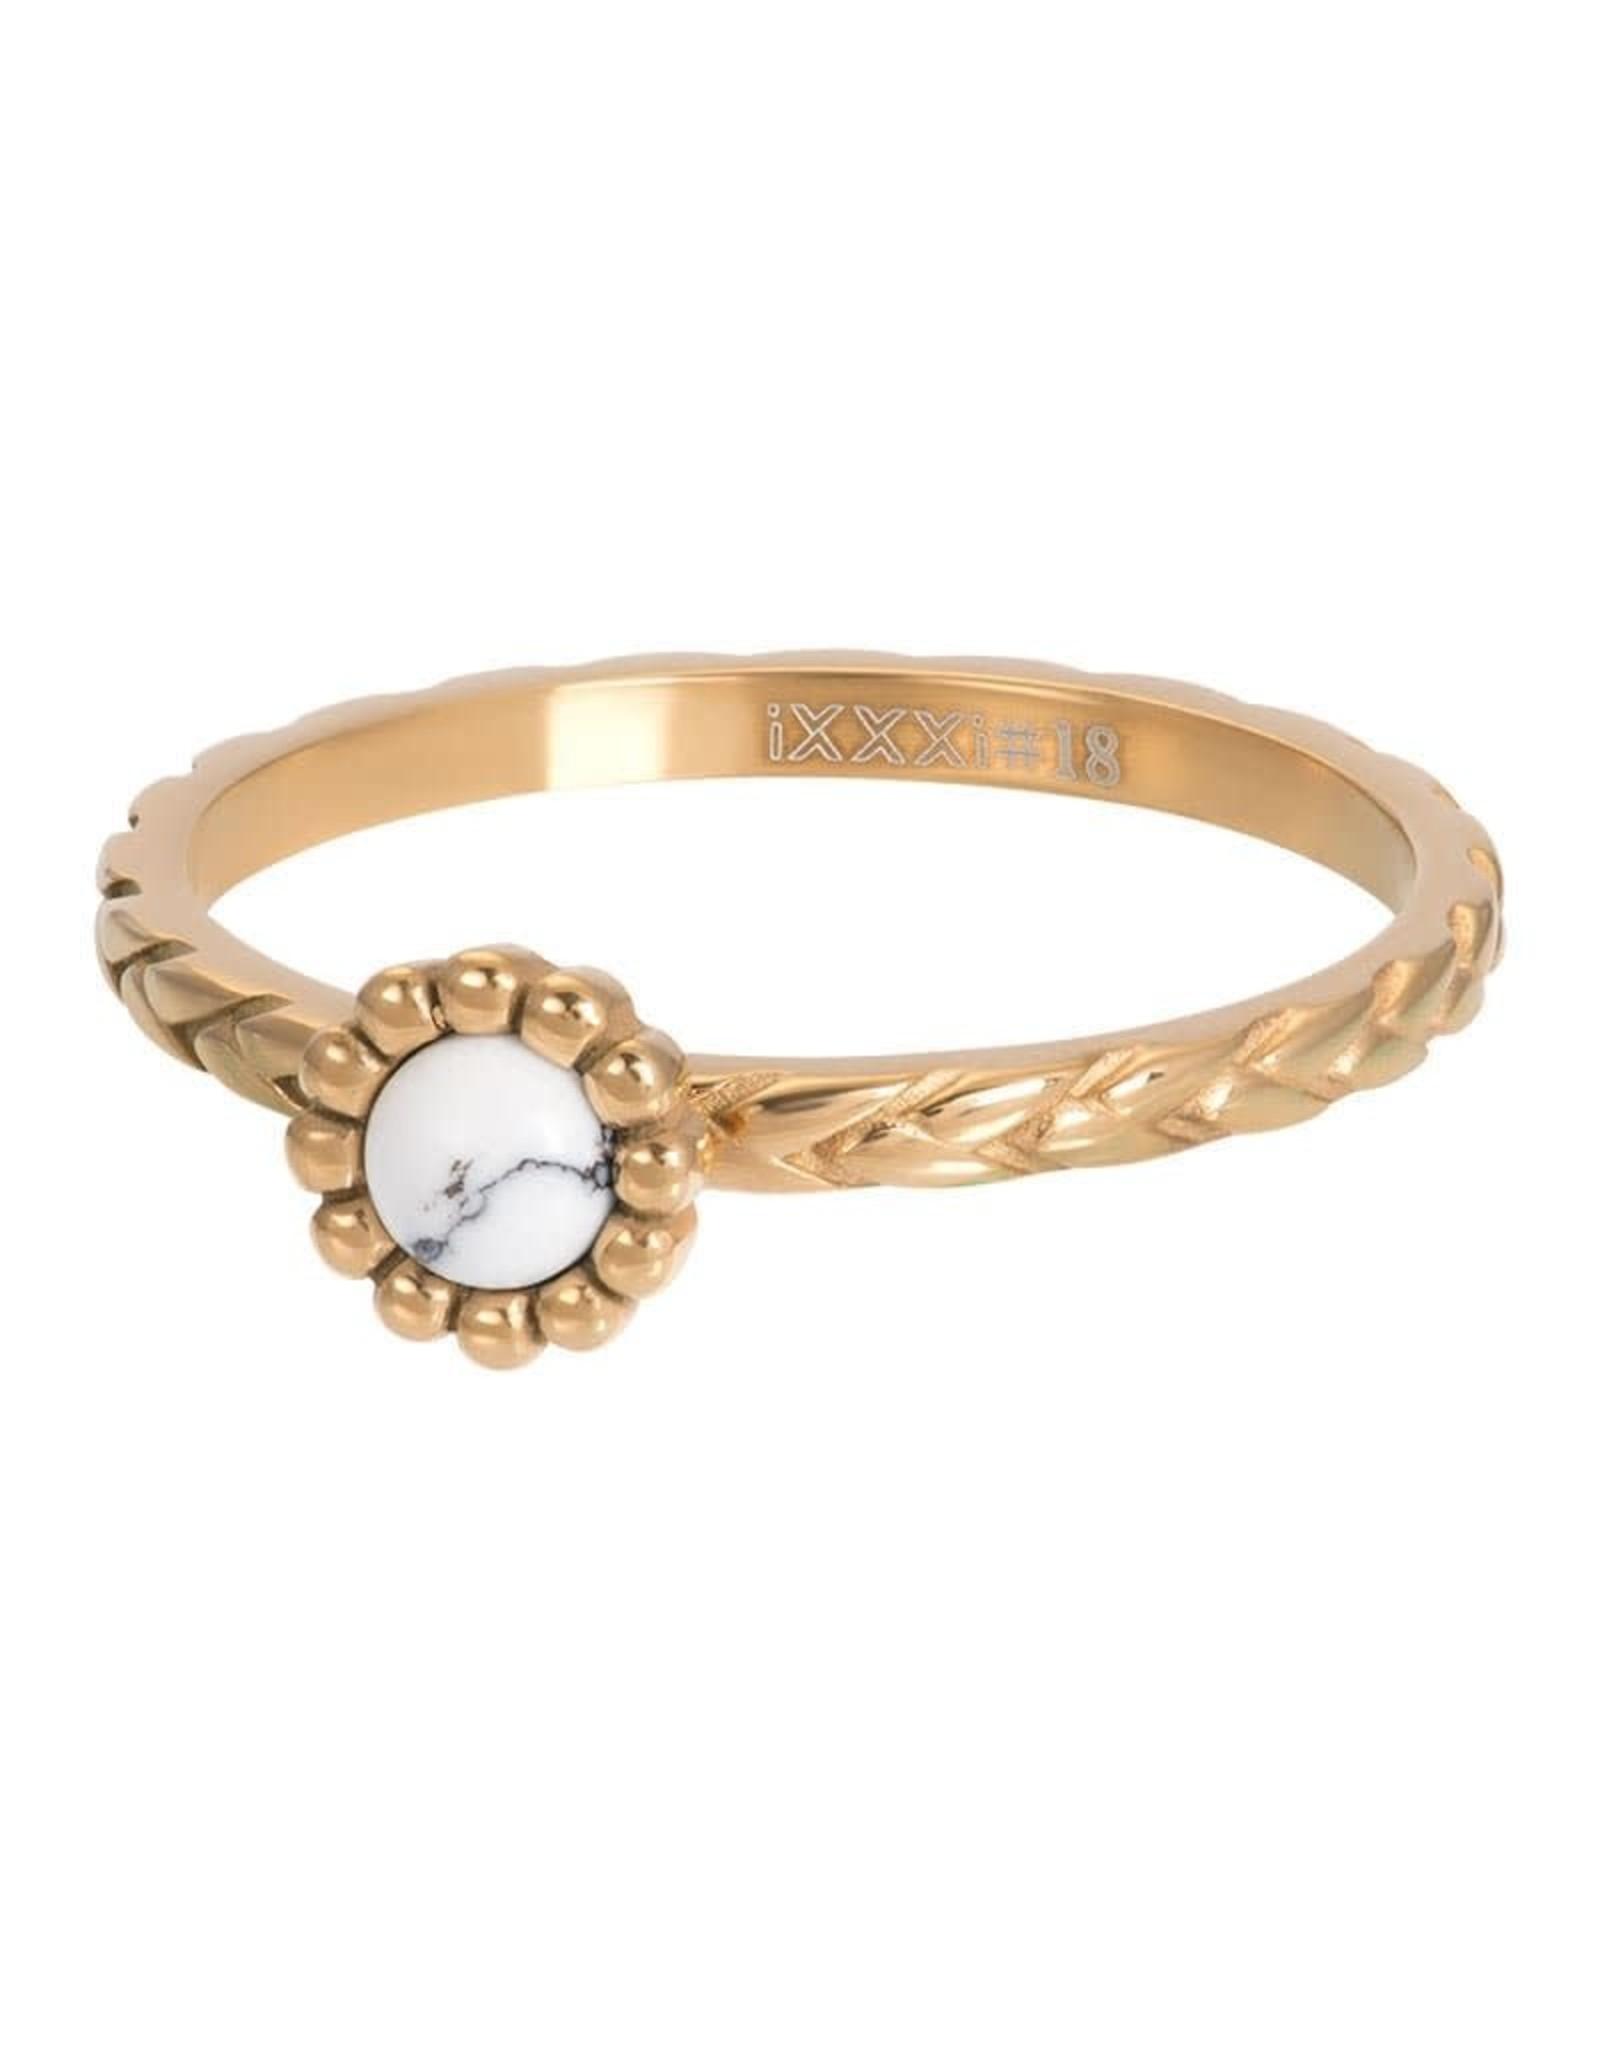 iXXXi Jewelry iXXXi vulring inspired white - goud